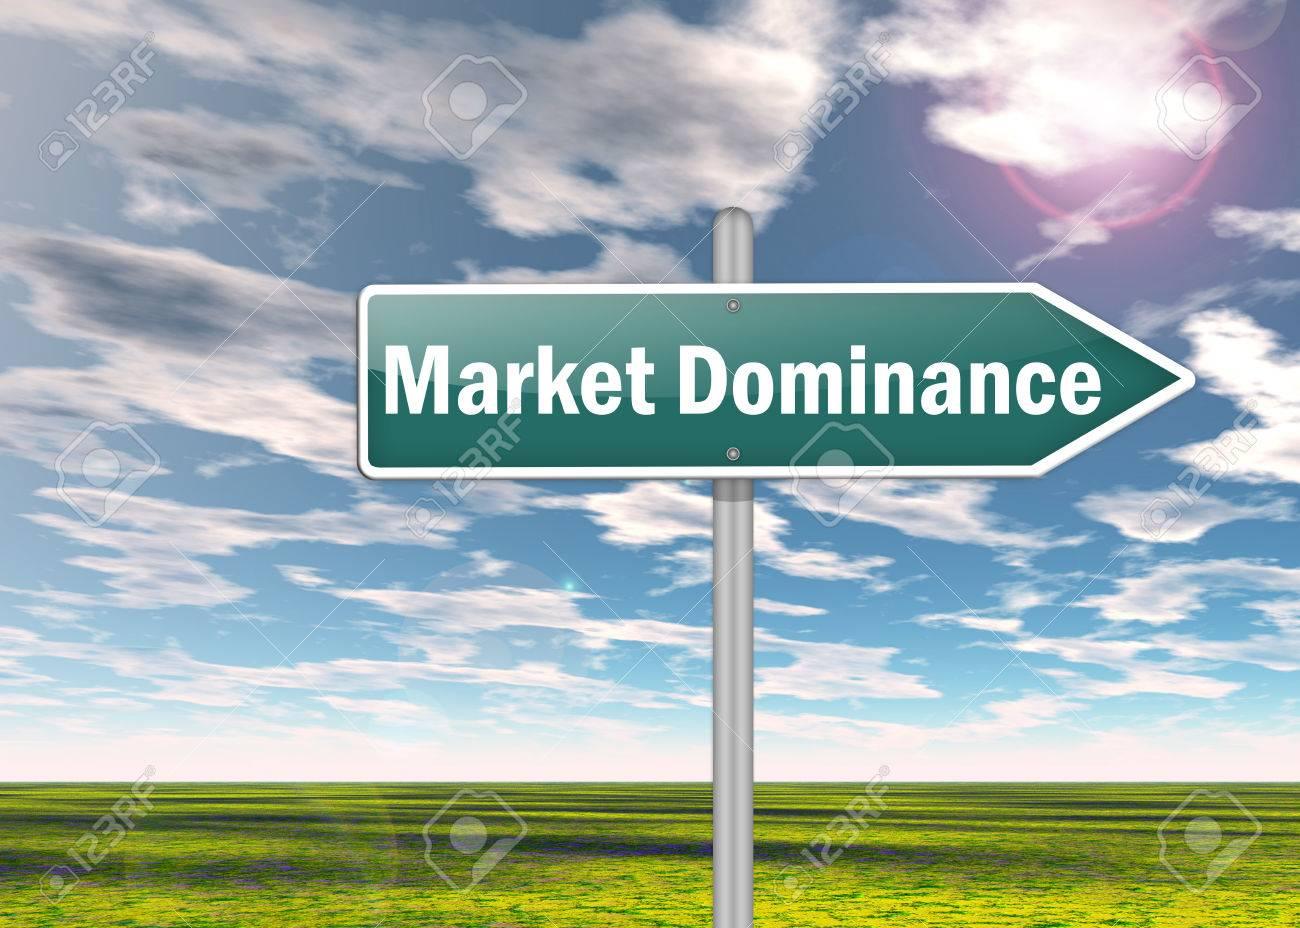 Highway Signpost Market Dominance Royalty Free Stock Photo - Image ...